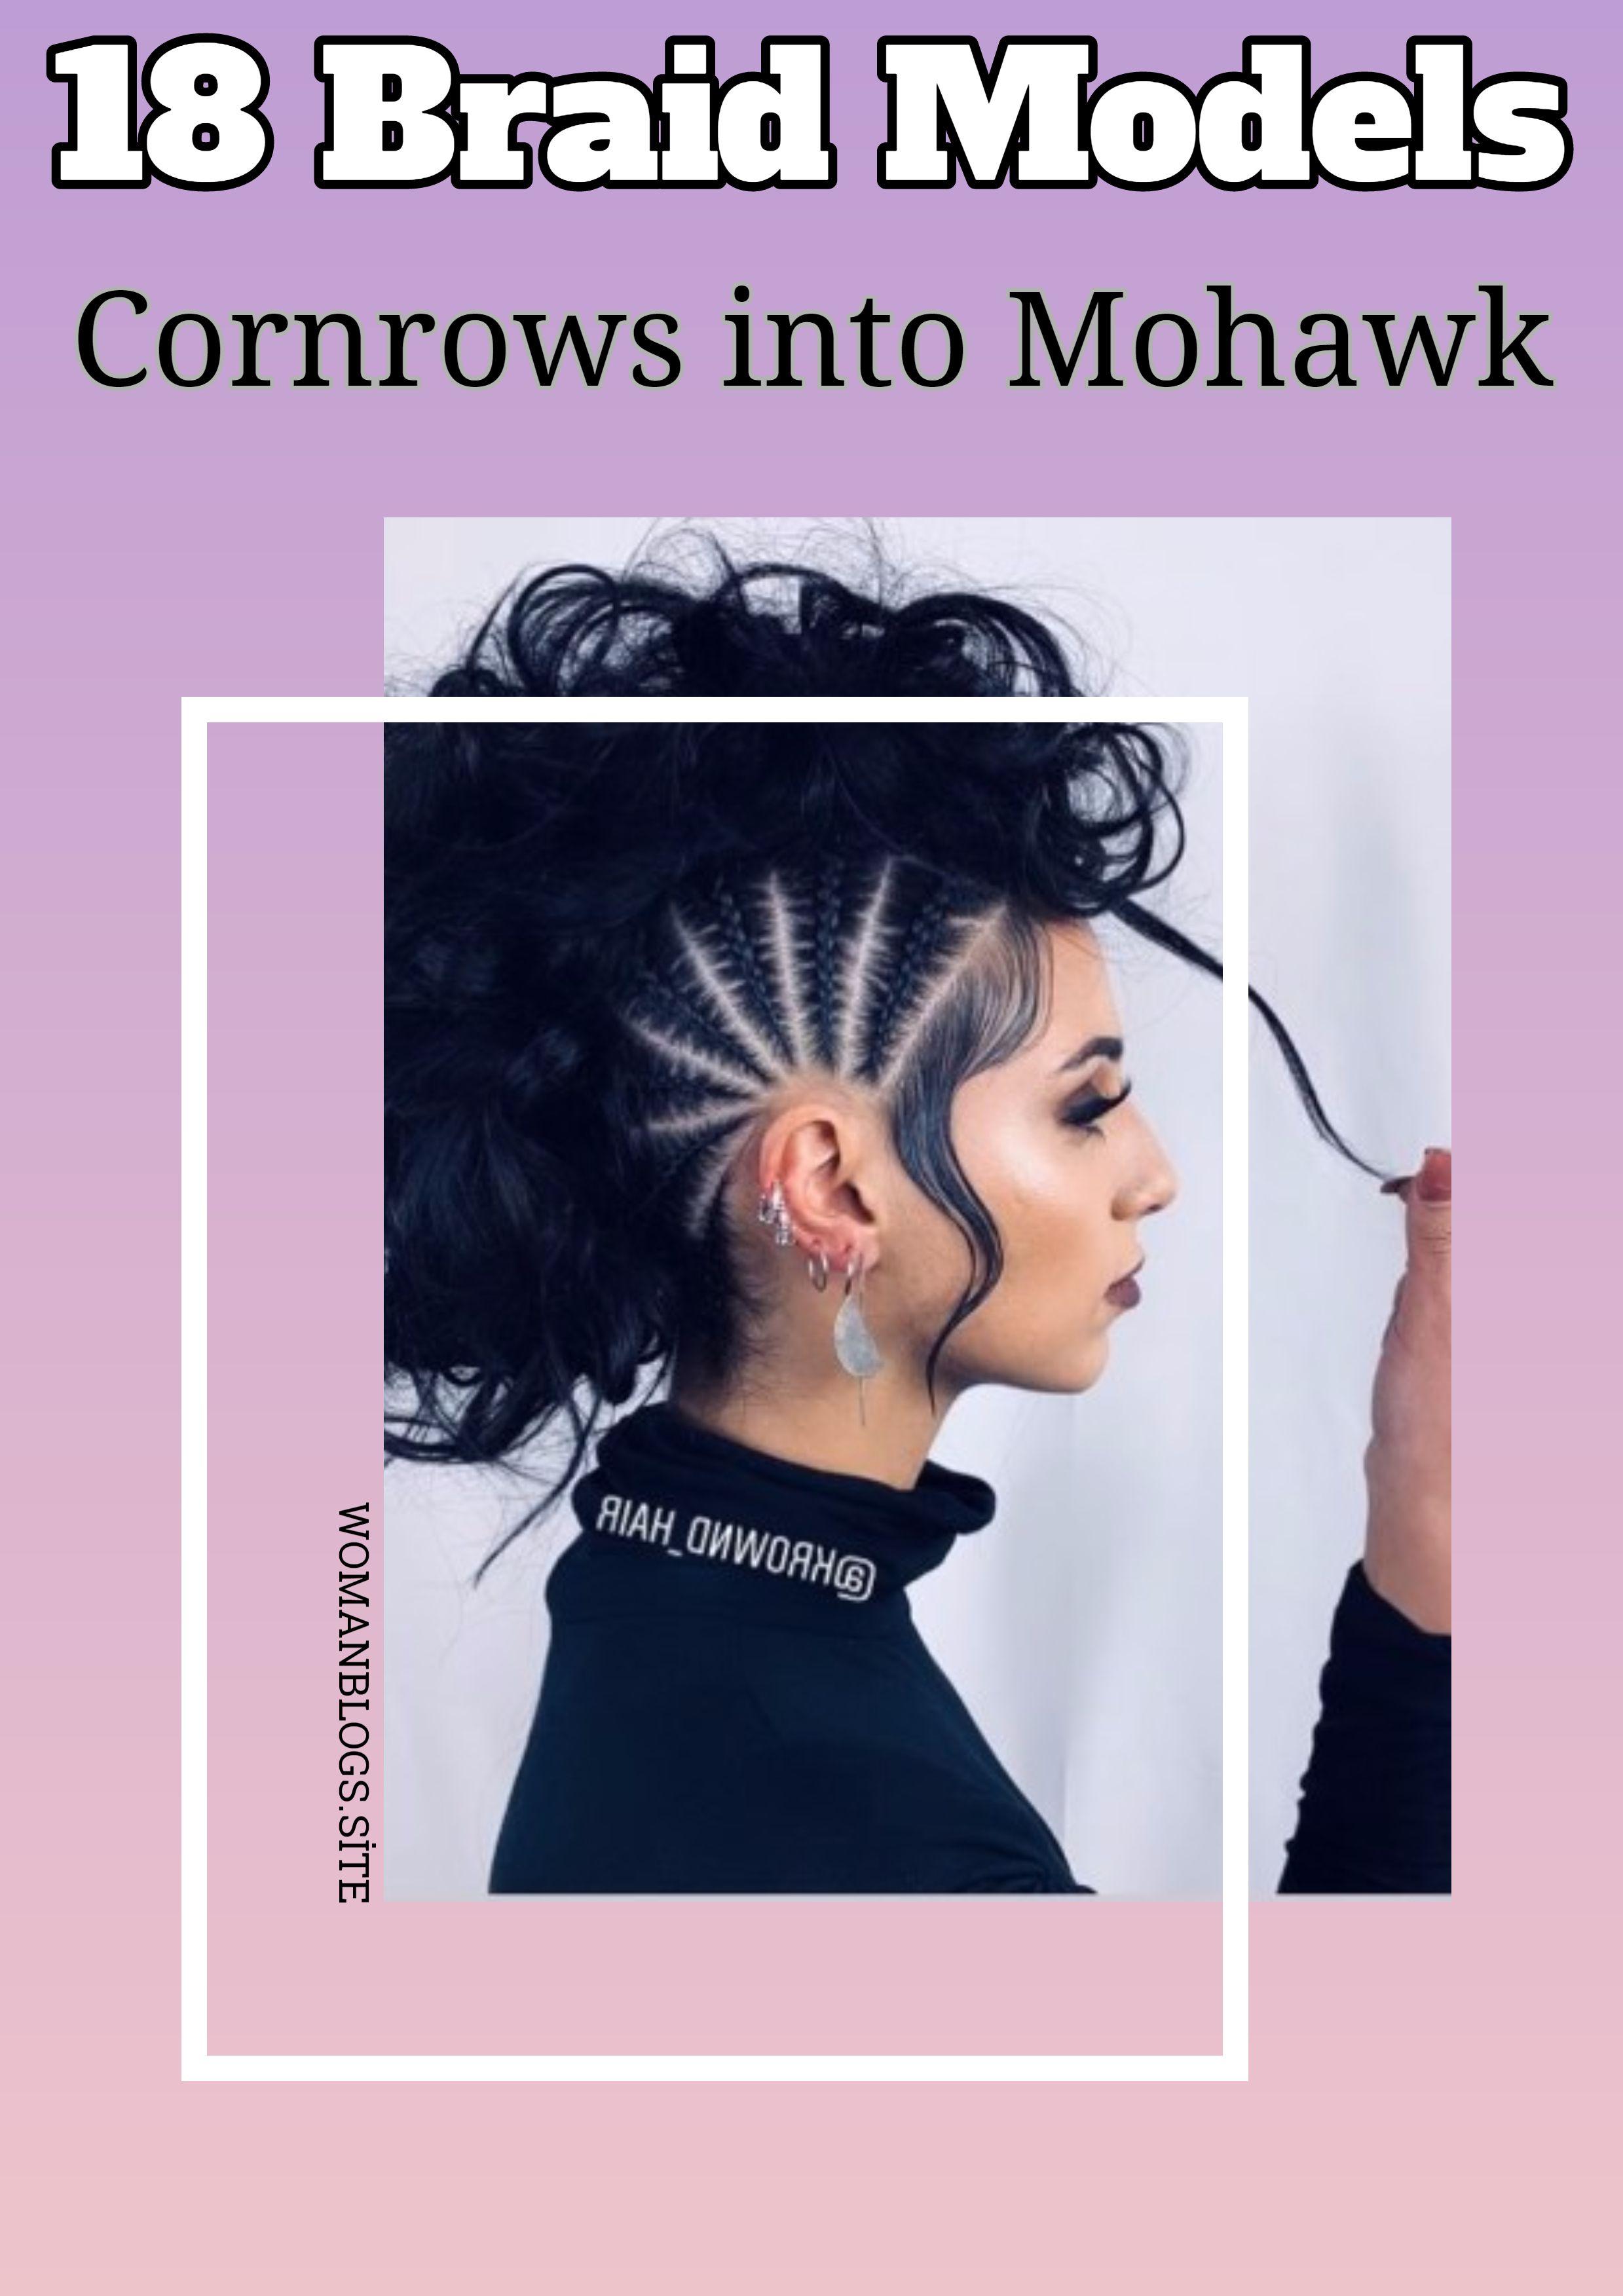 18 Beautiful Braids, Beautiful Than Each Other Cornrows into Mohawk.